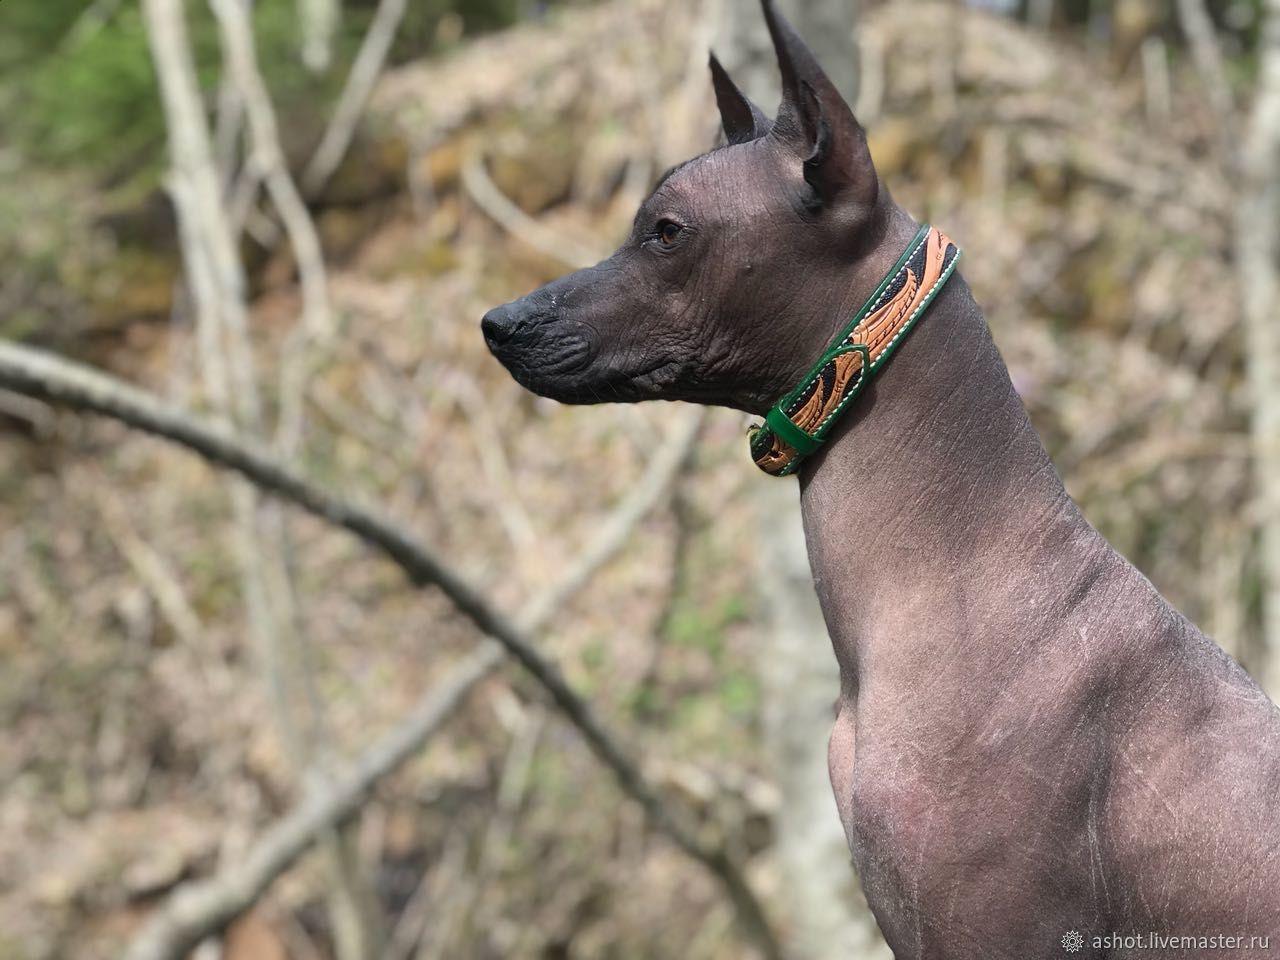 Collar for dog genuine leather, leather collar for dogs, Dog - Collars, Yoshkar-Ola,  Фото №1